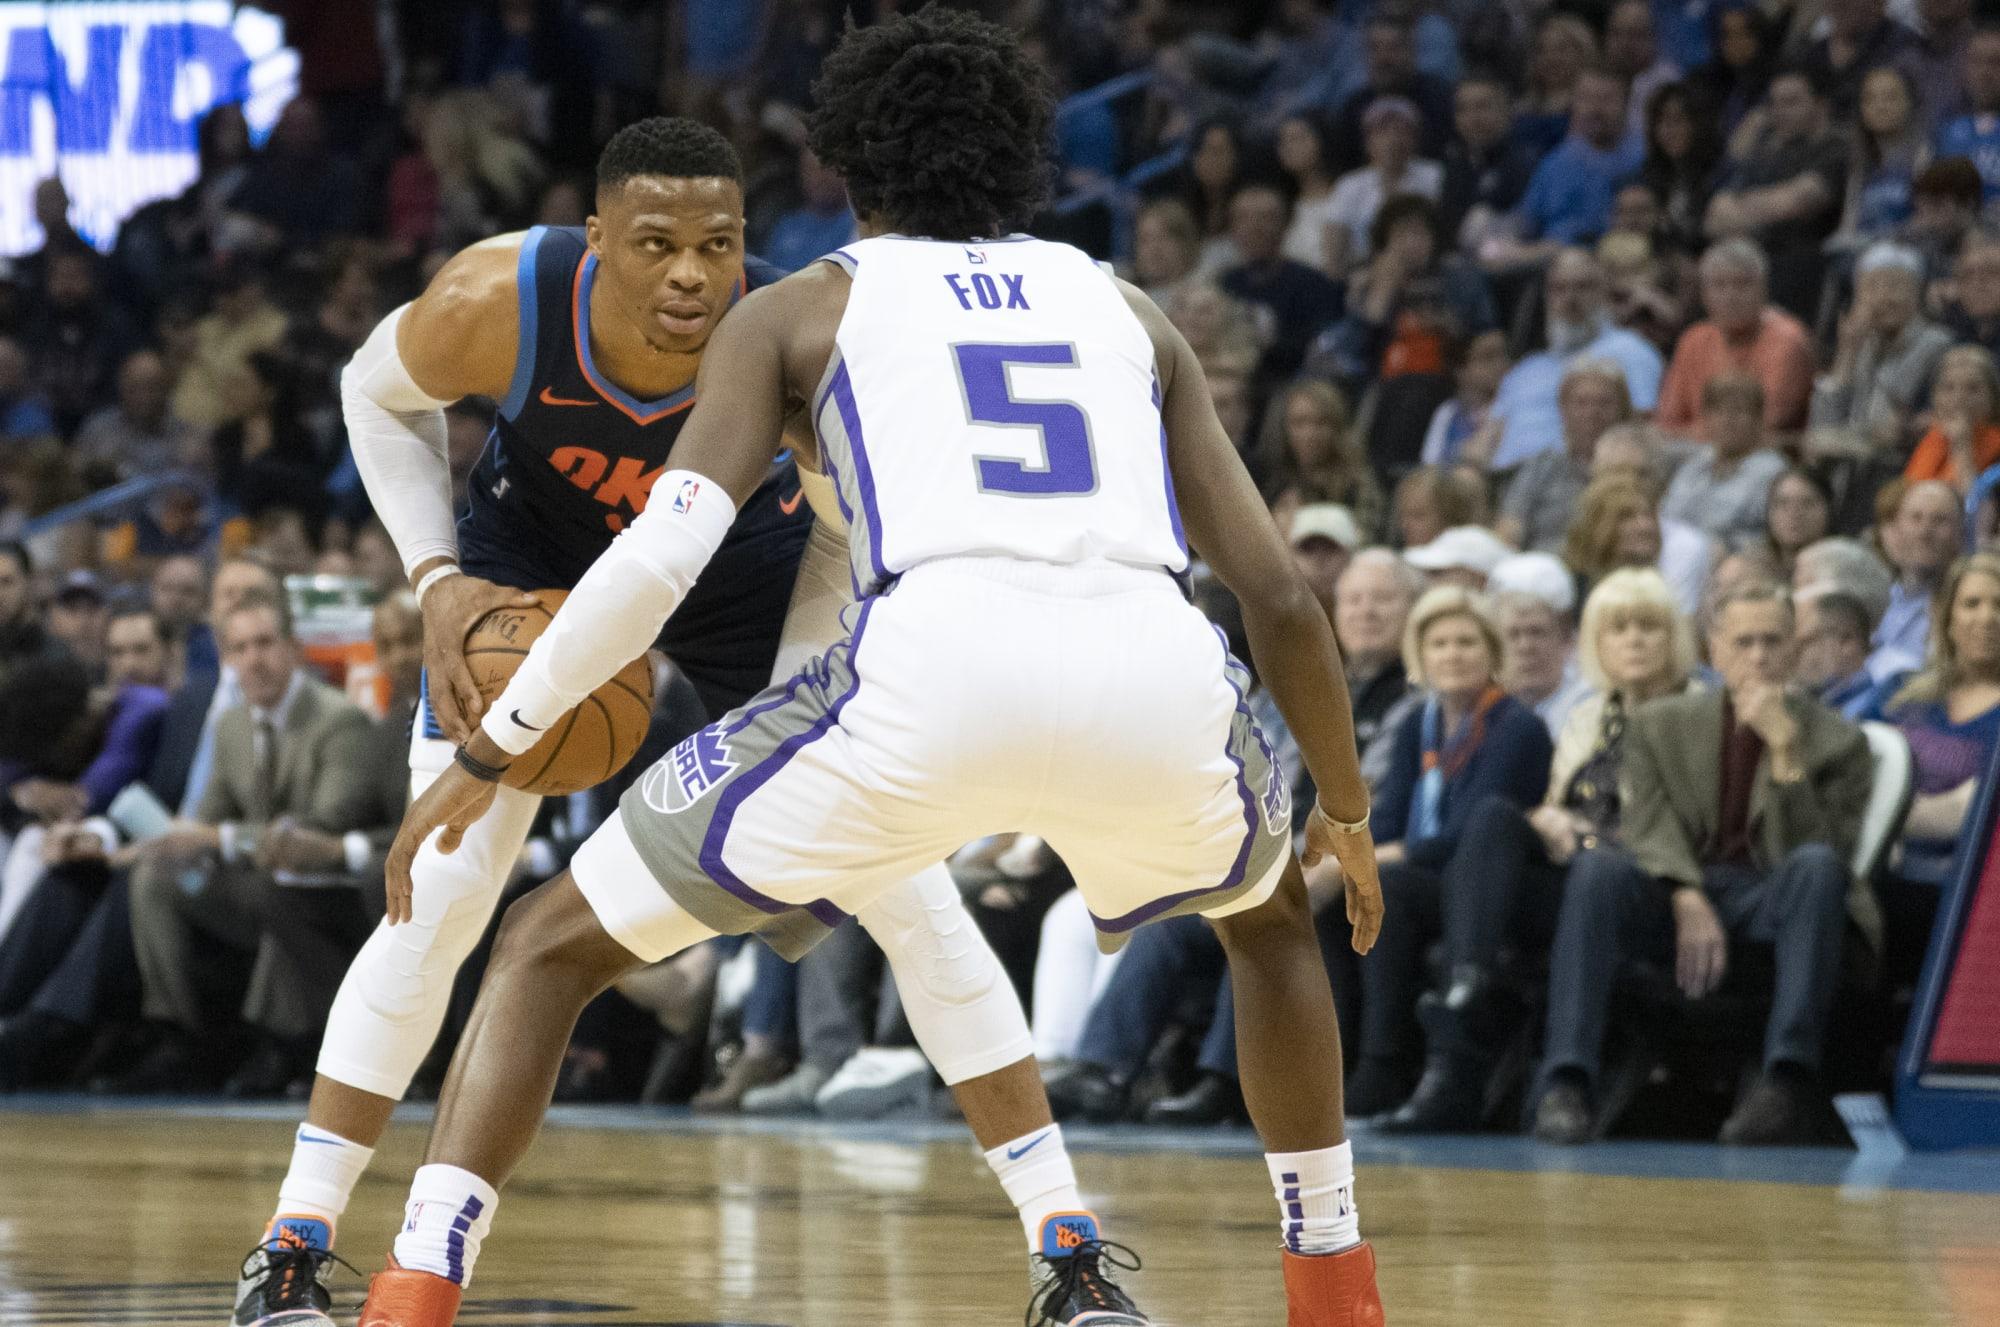 De'Aaron Fox cites Rockets' Russell Westbrook as favorite player